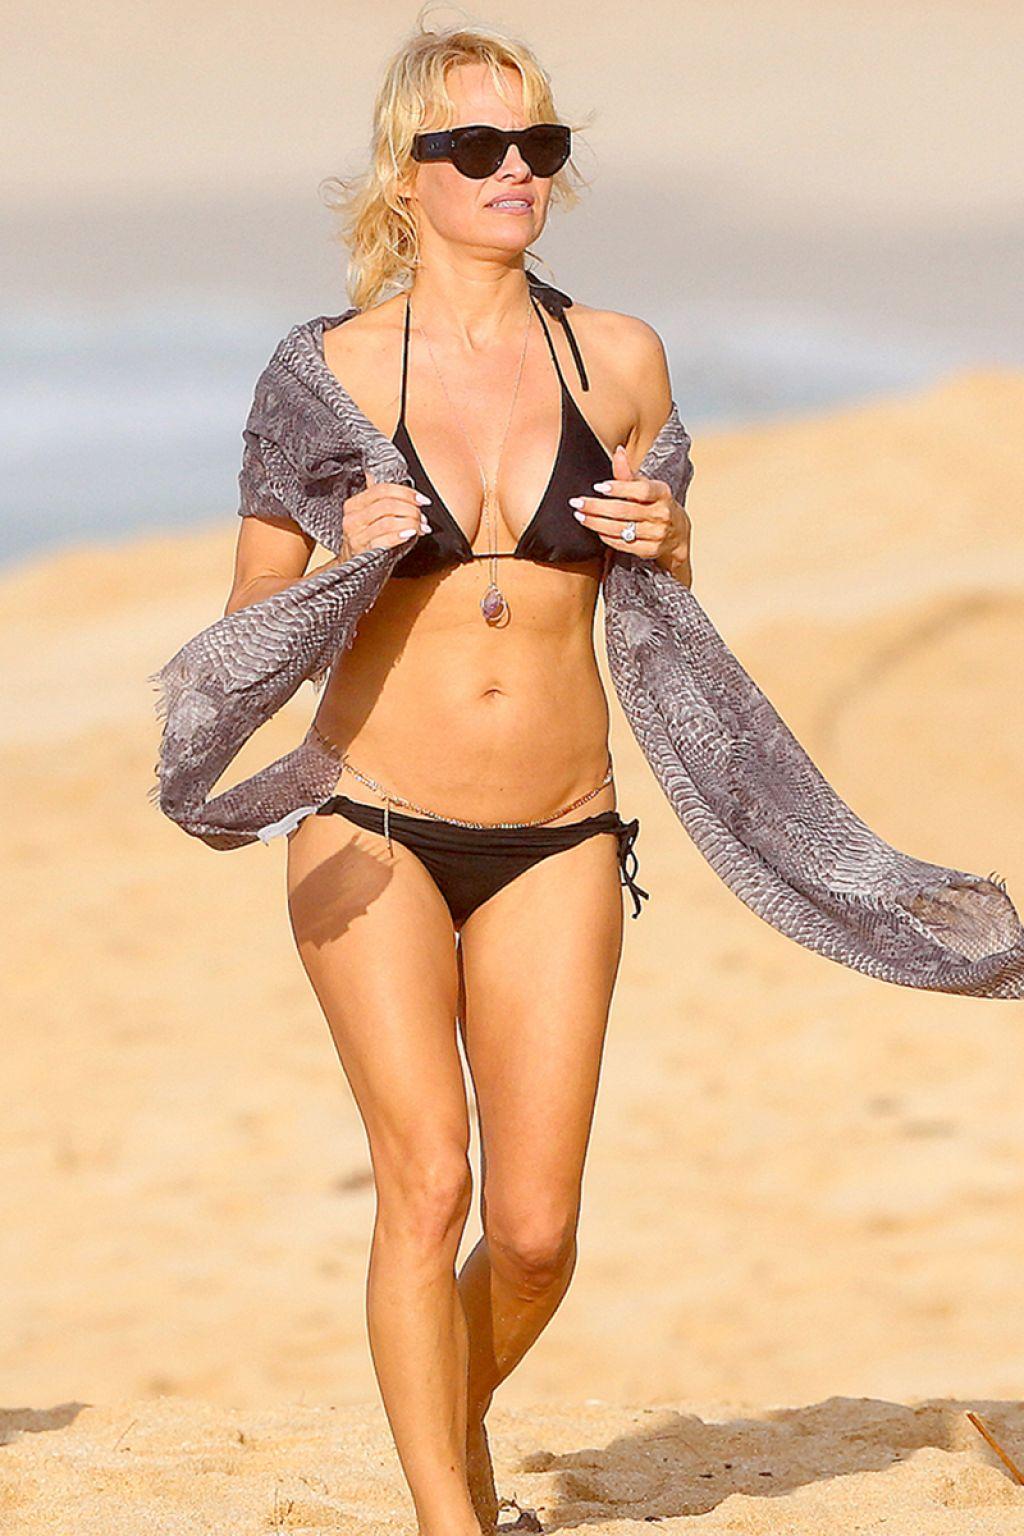 micro pamela bikini anderson